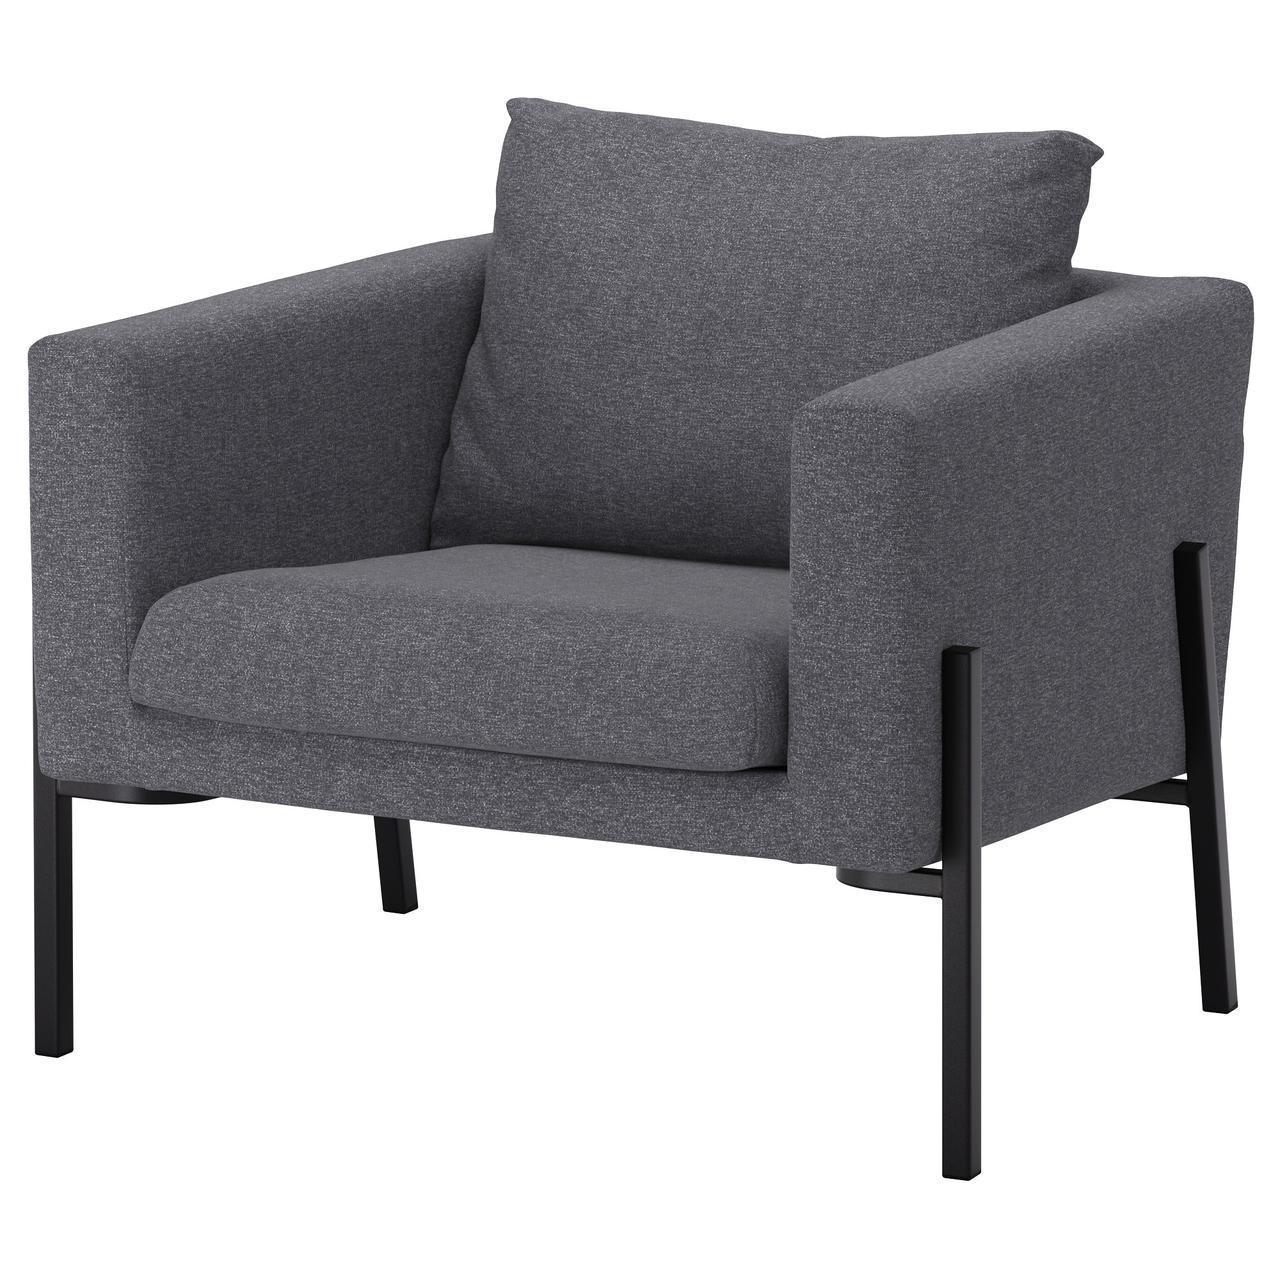 Кресло IKEA KOARP Gunnared серое черное 192.217.37